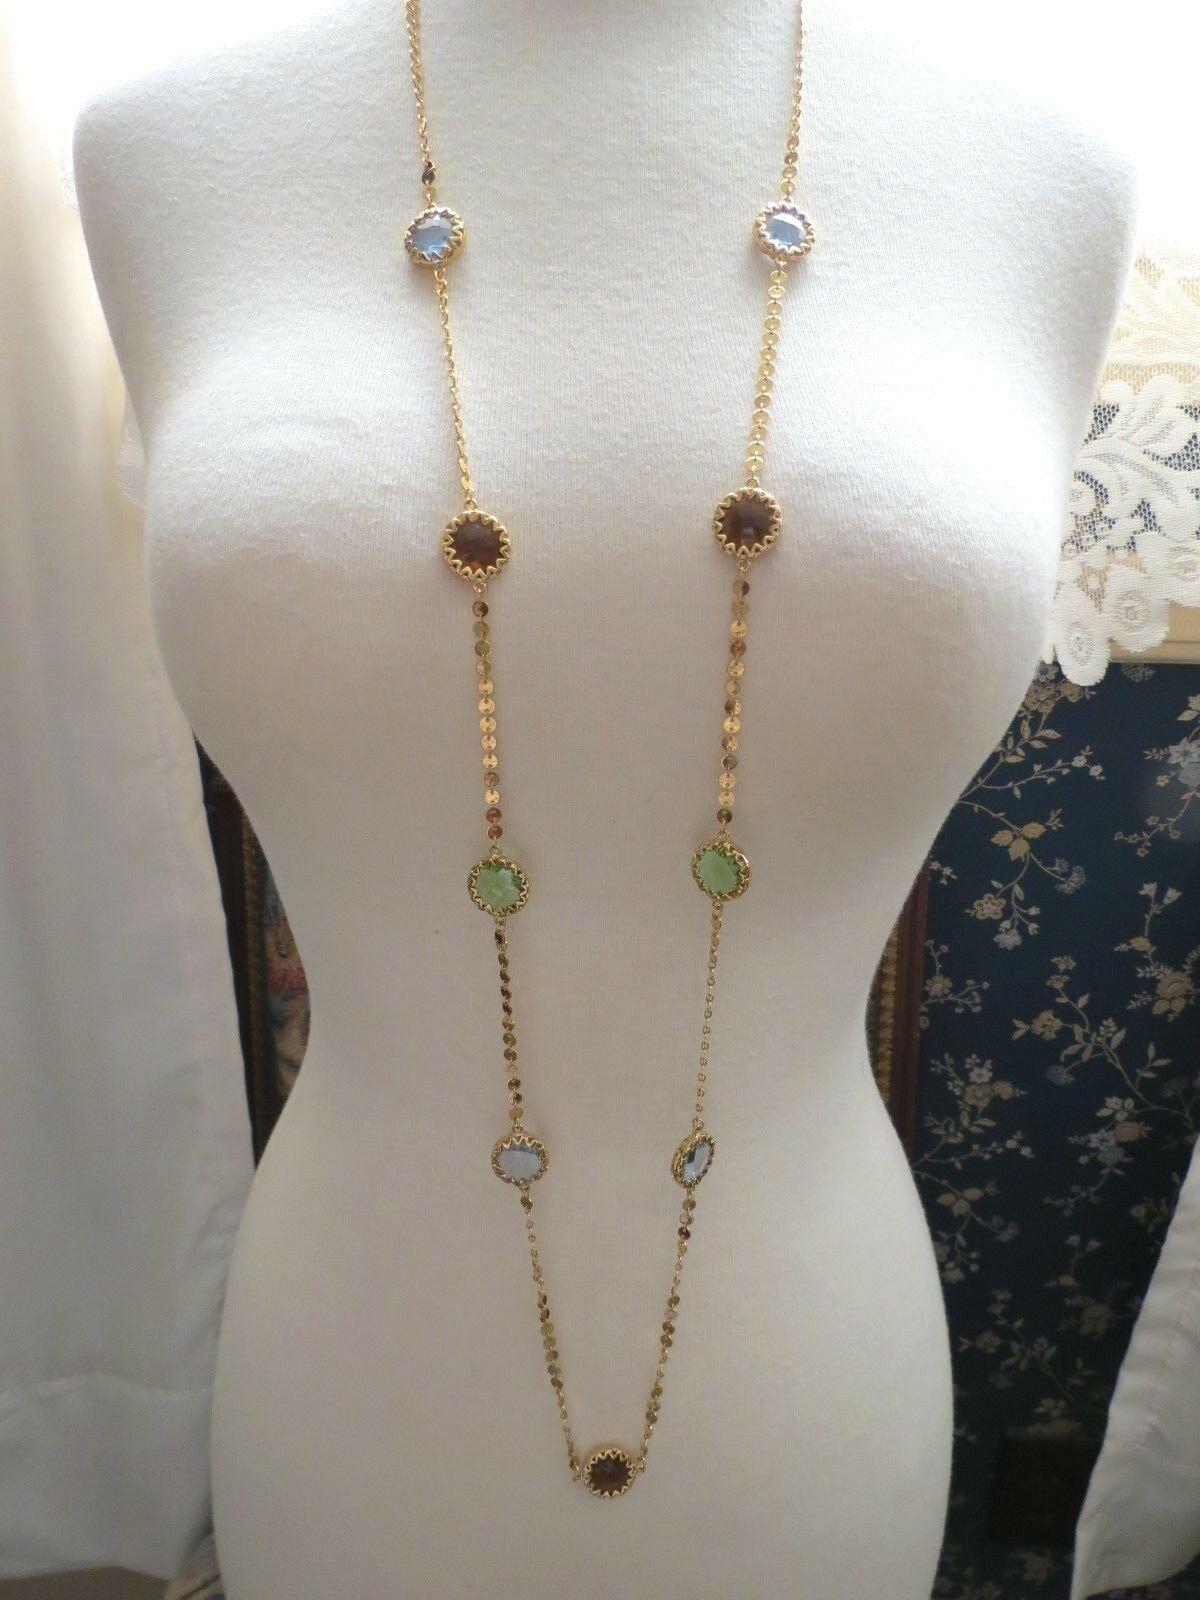 "Robert Verdi Bezel Set Crystal Necklace Gold Plated Links 46"" Cushion Designer"